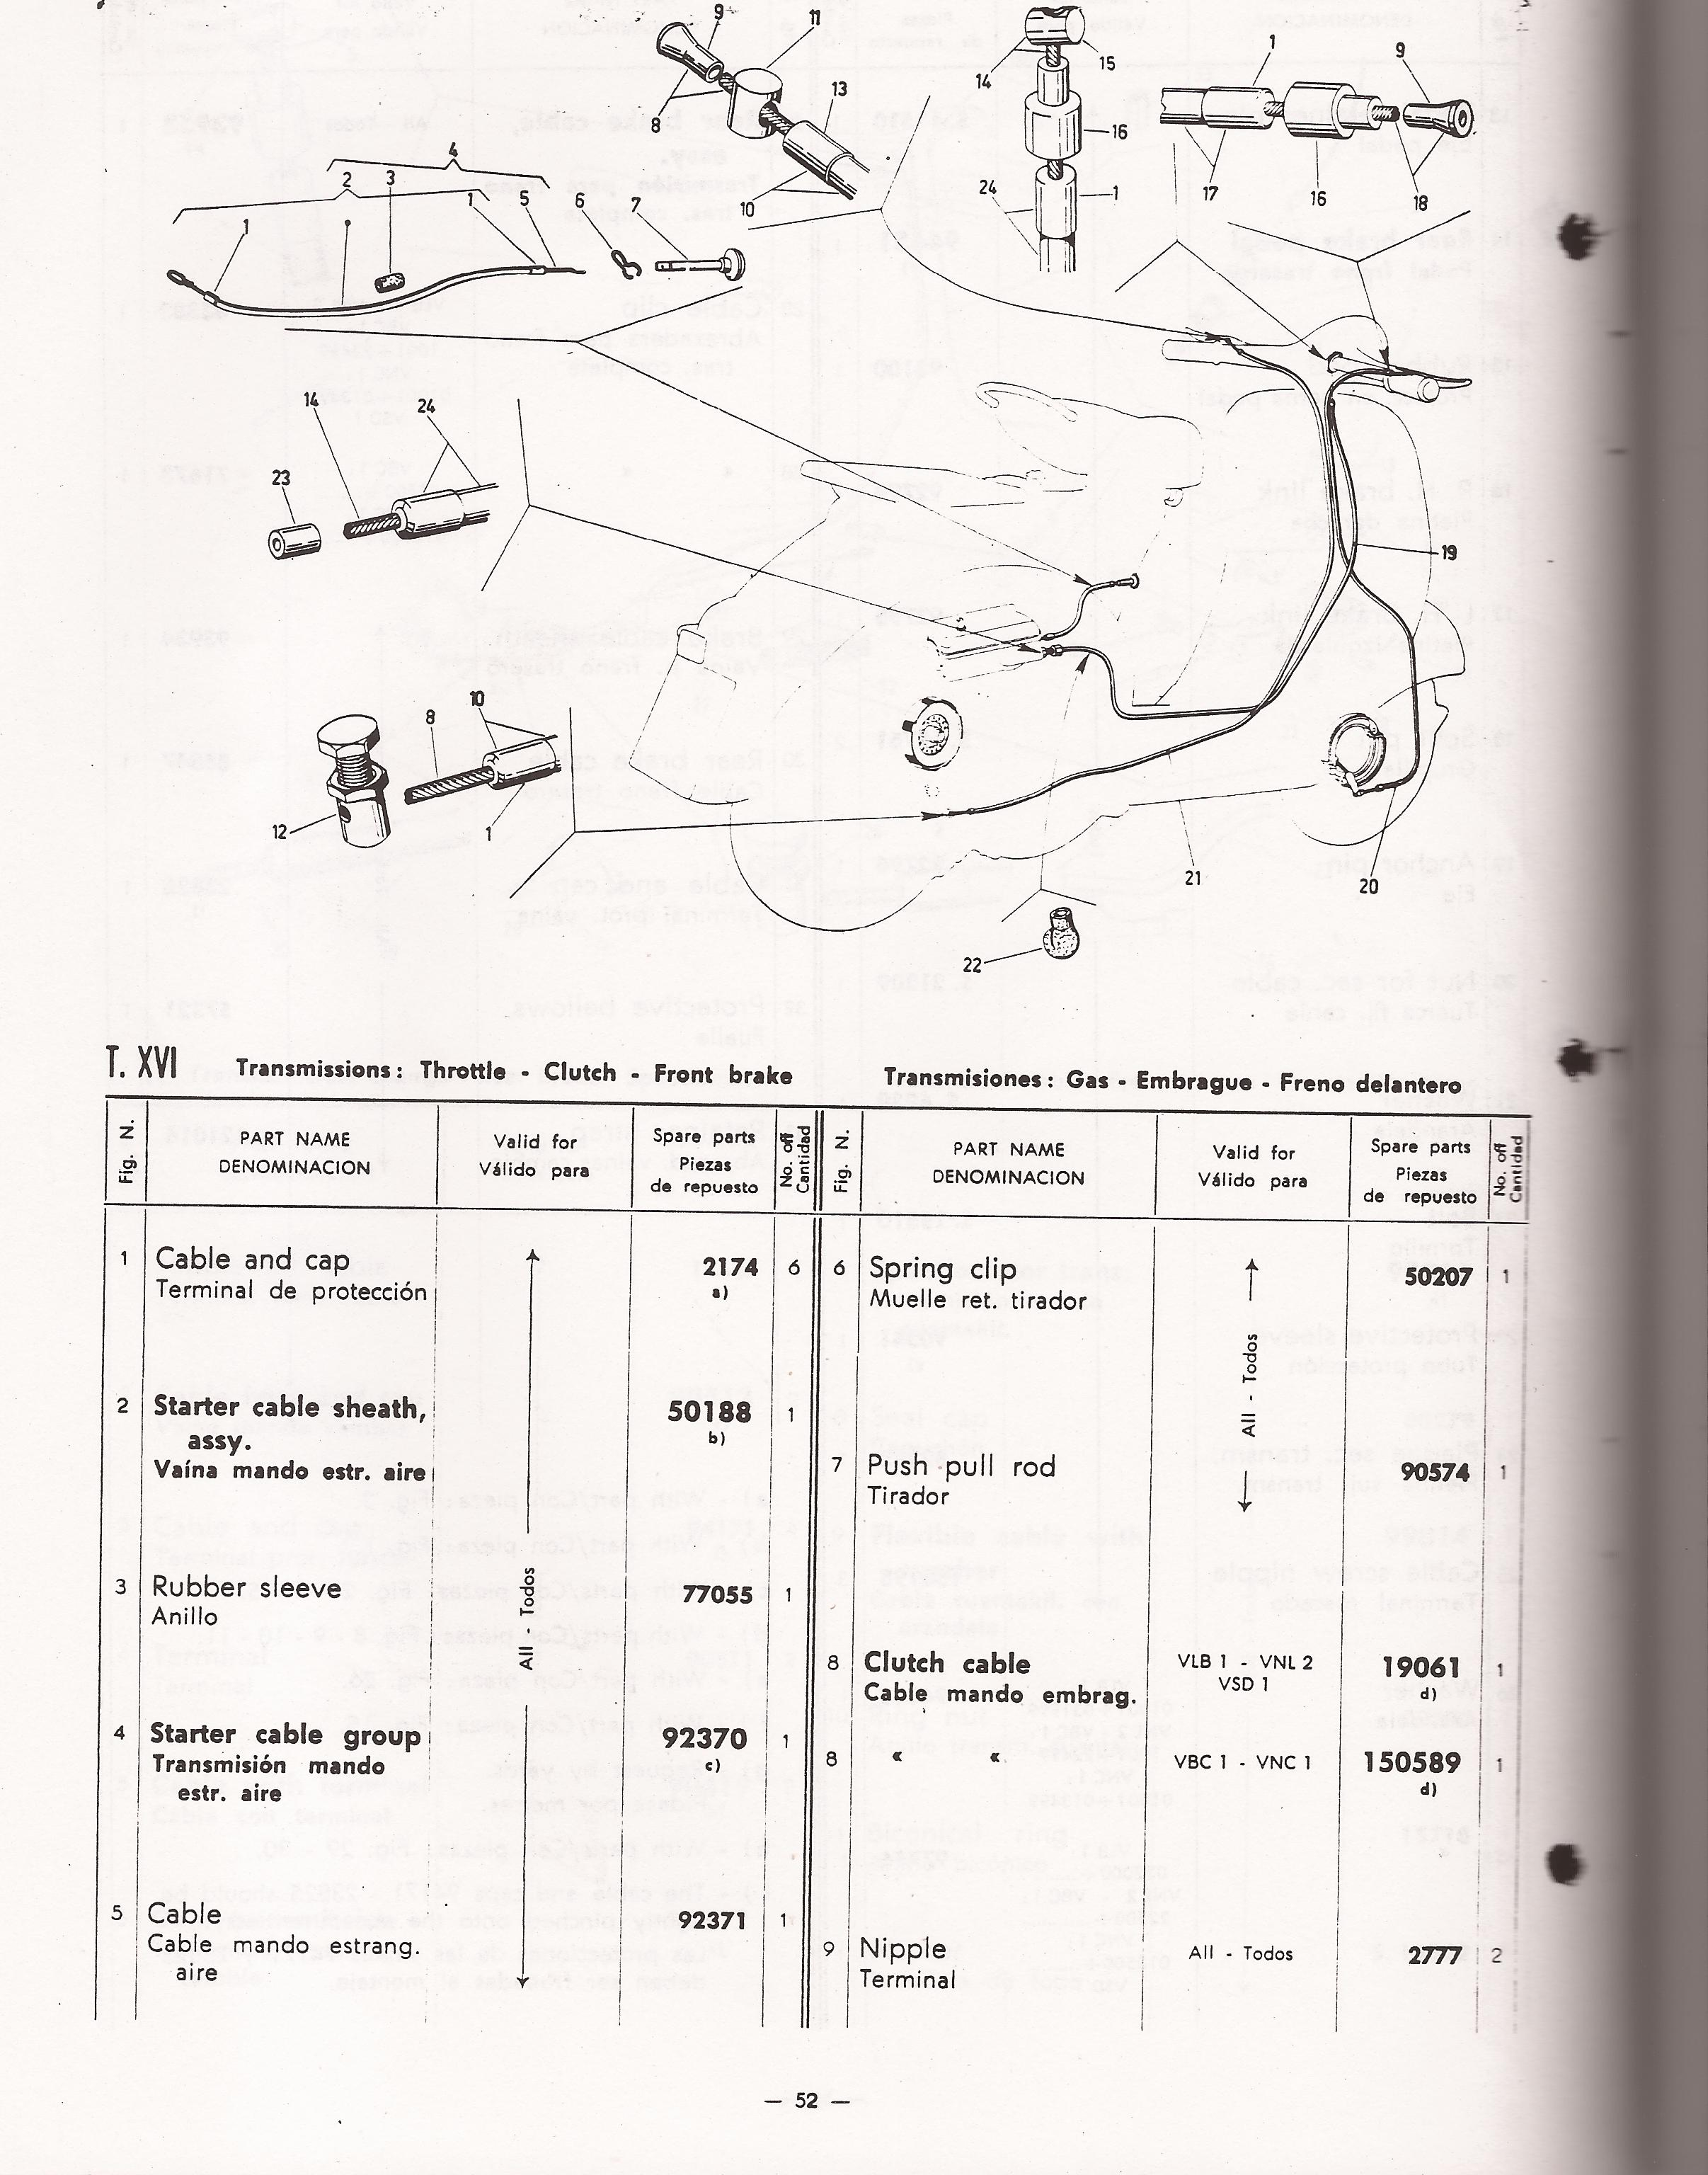 02-25-2013 vespa manaul 58.jpg